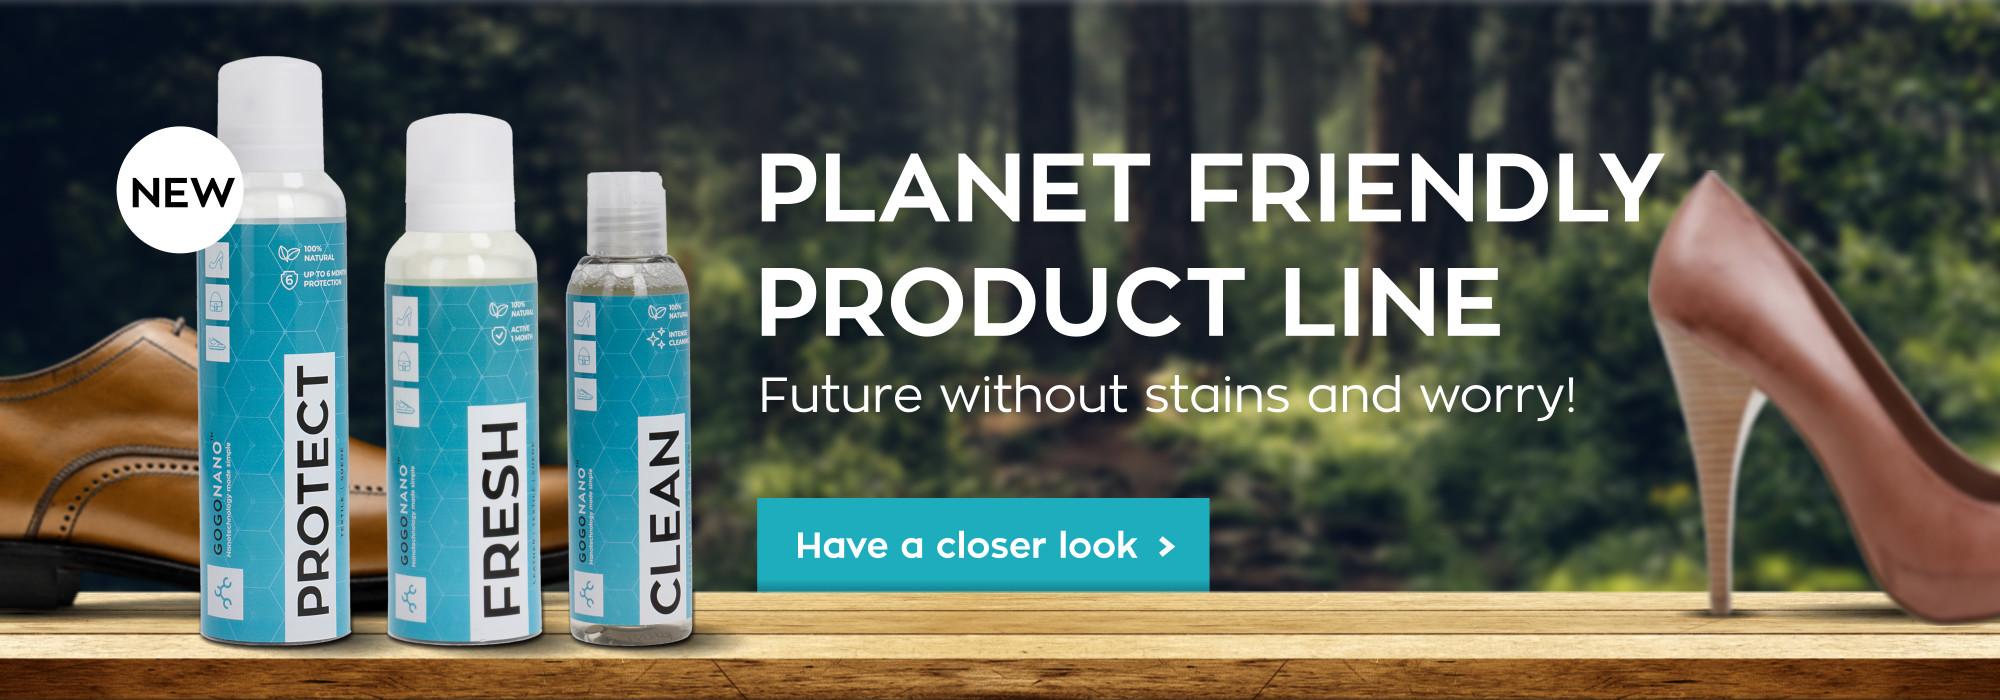 GoGoNano Planet Friendly Product Line